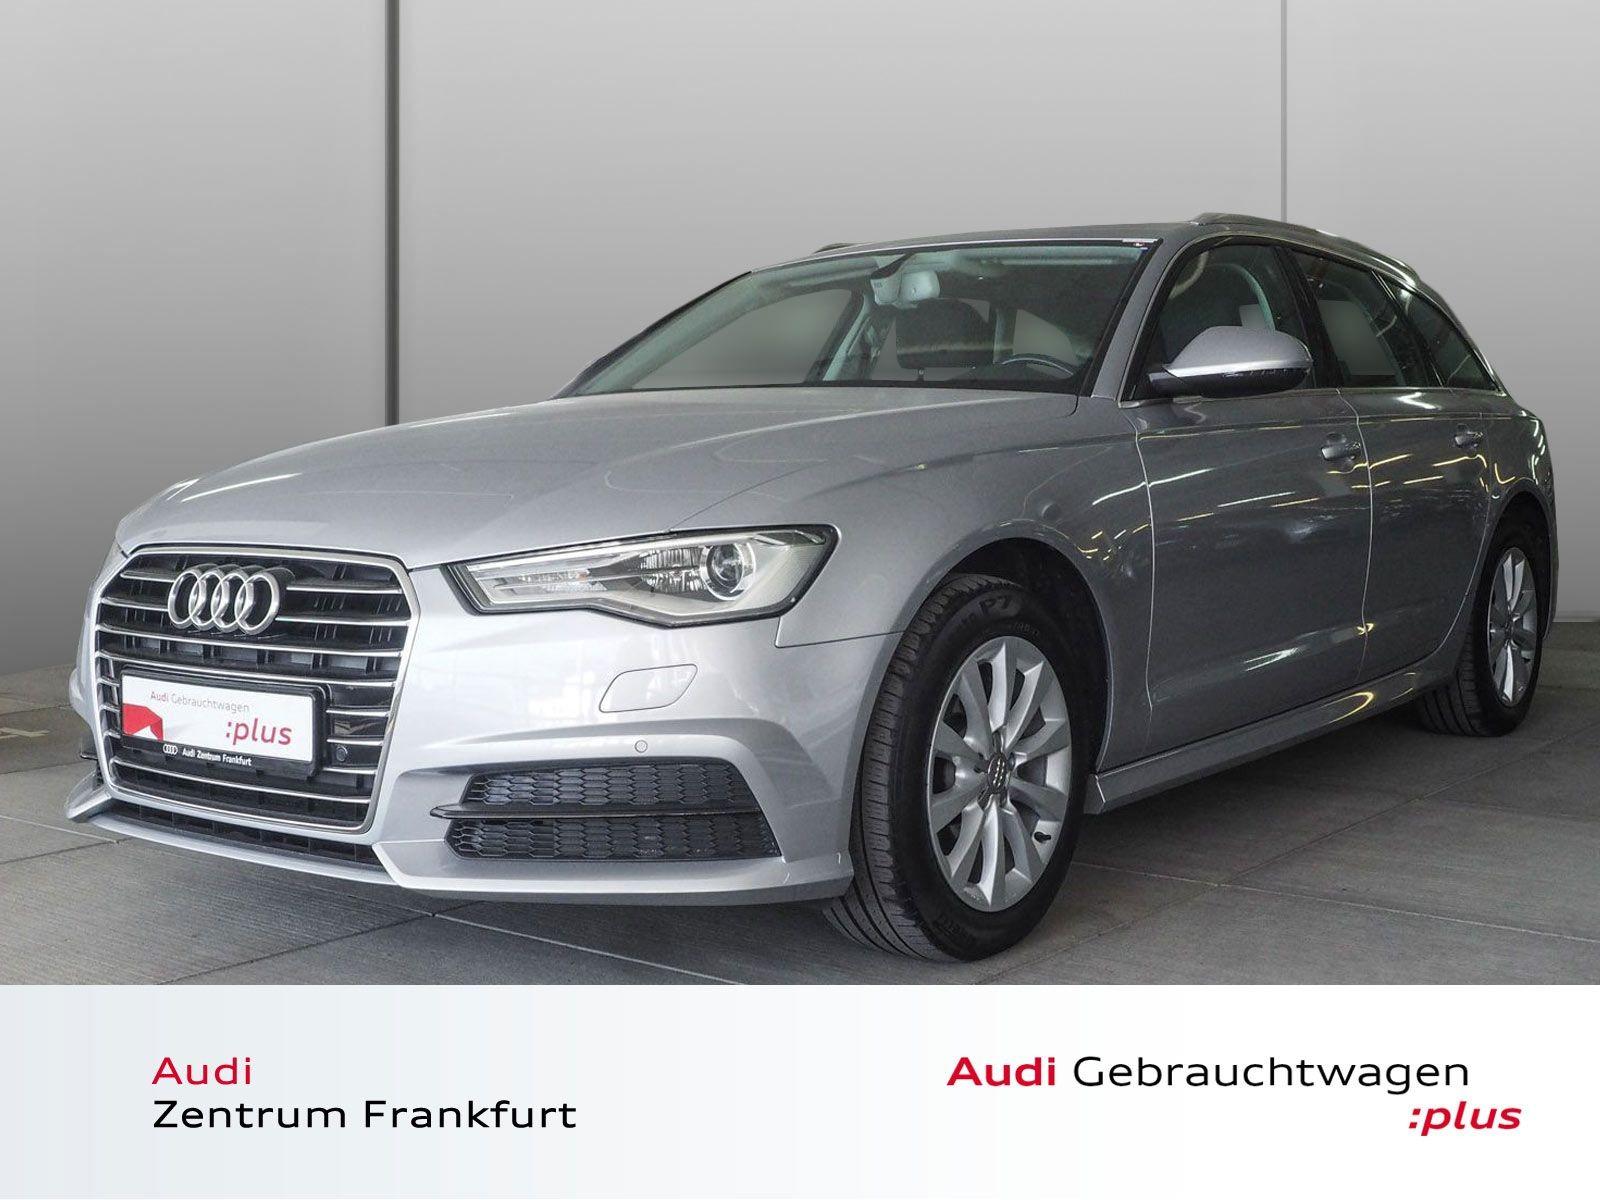 Audi A6 Avant 2.0 TDI ultra S tronic Navi Xenon Tempomat, Jahr 2018, Diesel